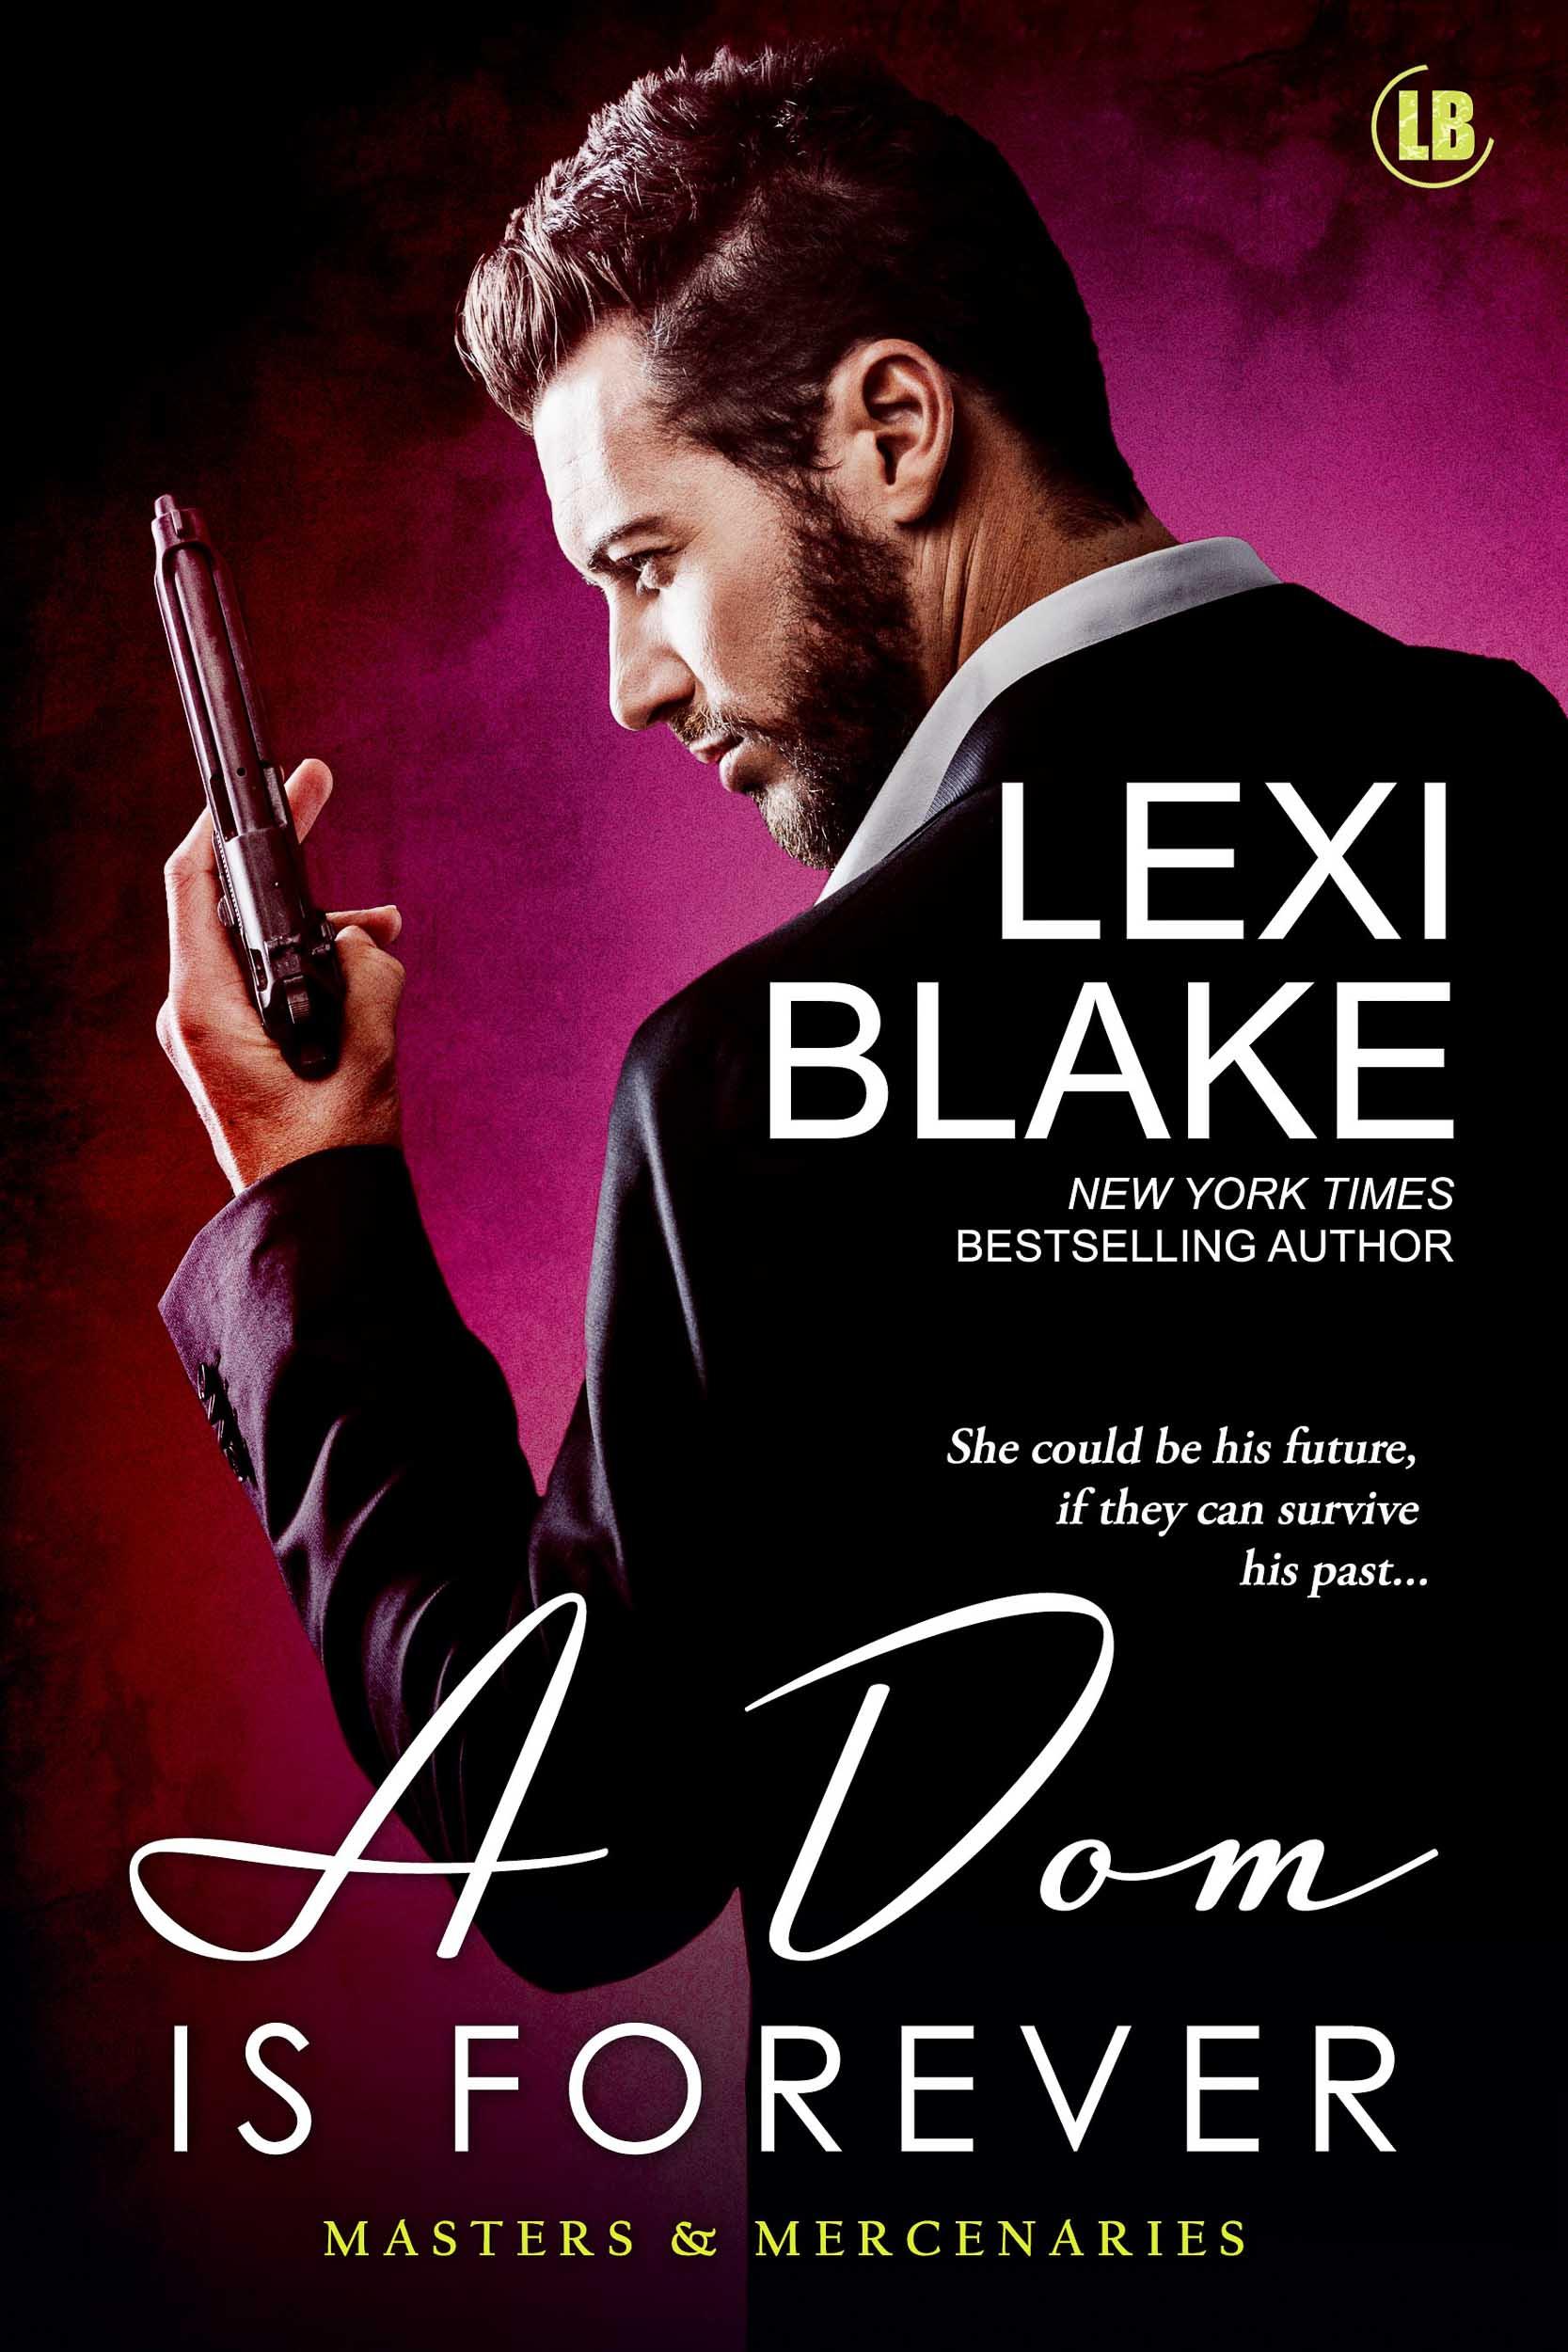 Lexi Blake A Dom Is Forever.jpg